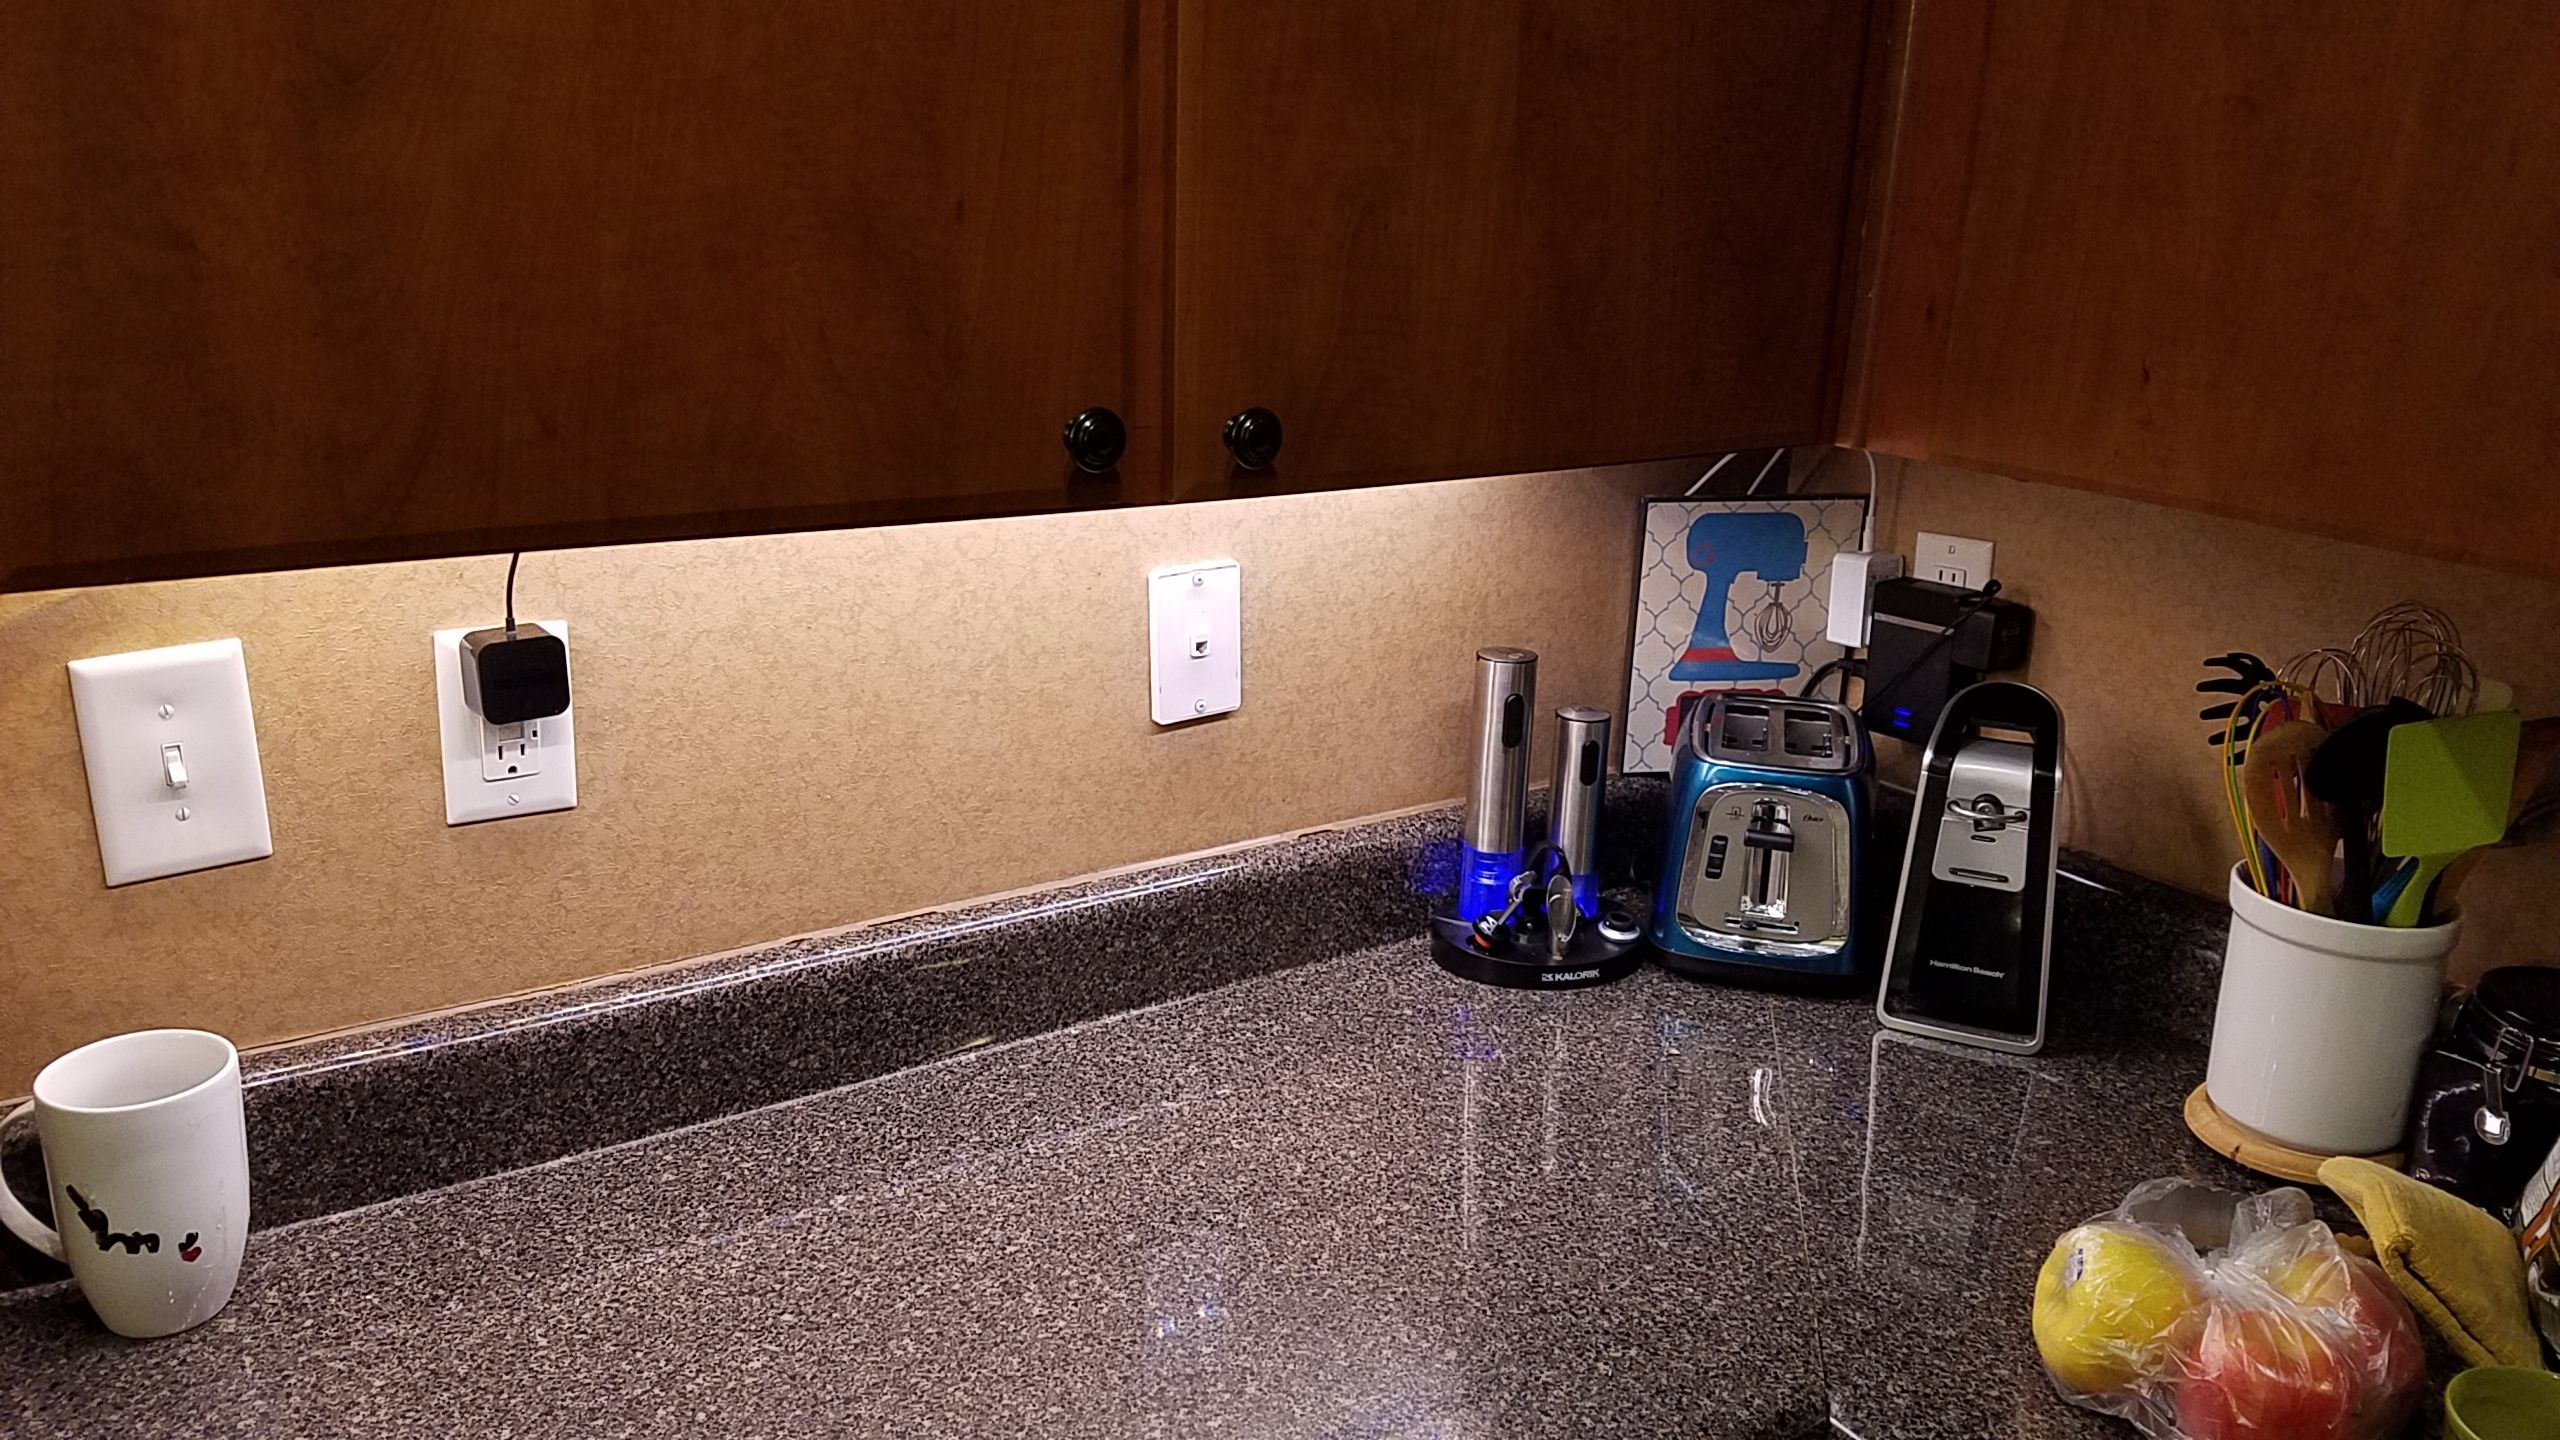 Philips Hue Lightstrip Extension For Cabinet Lighting